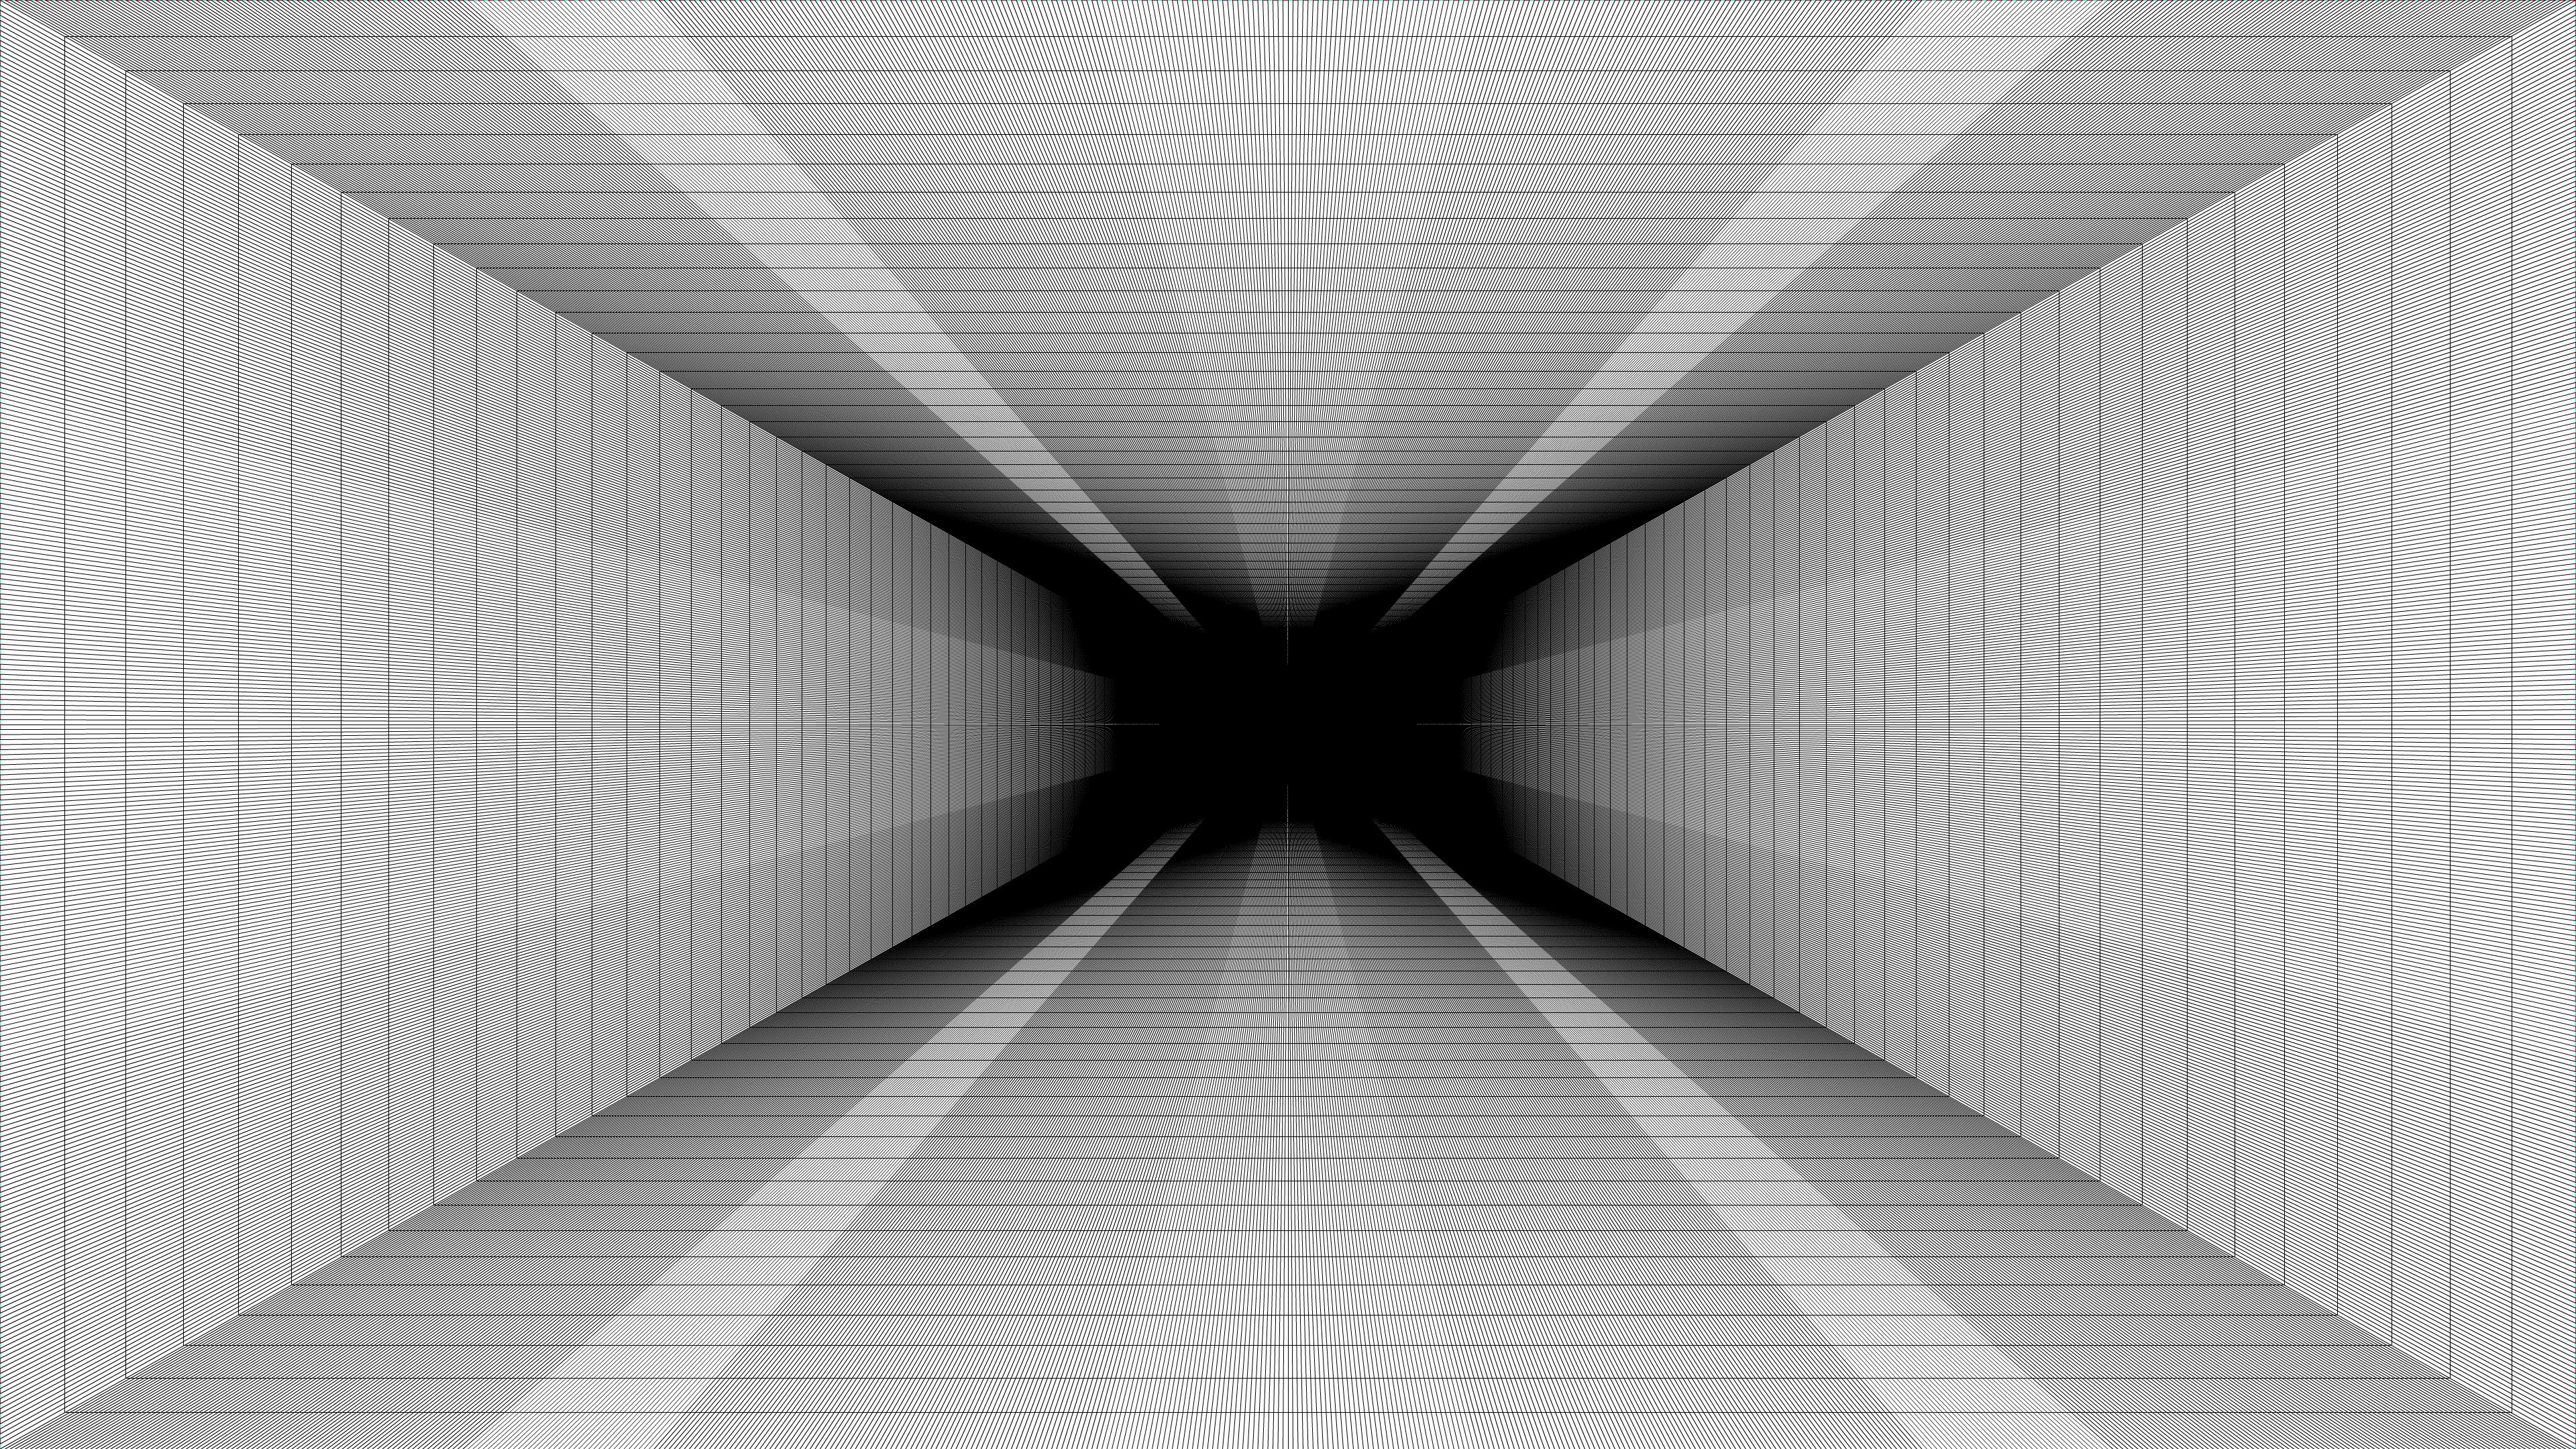 Perspective Grid Prototype [Flawed]